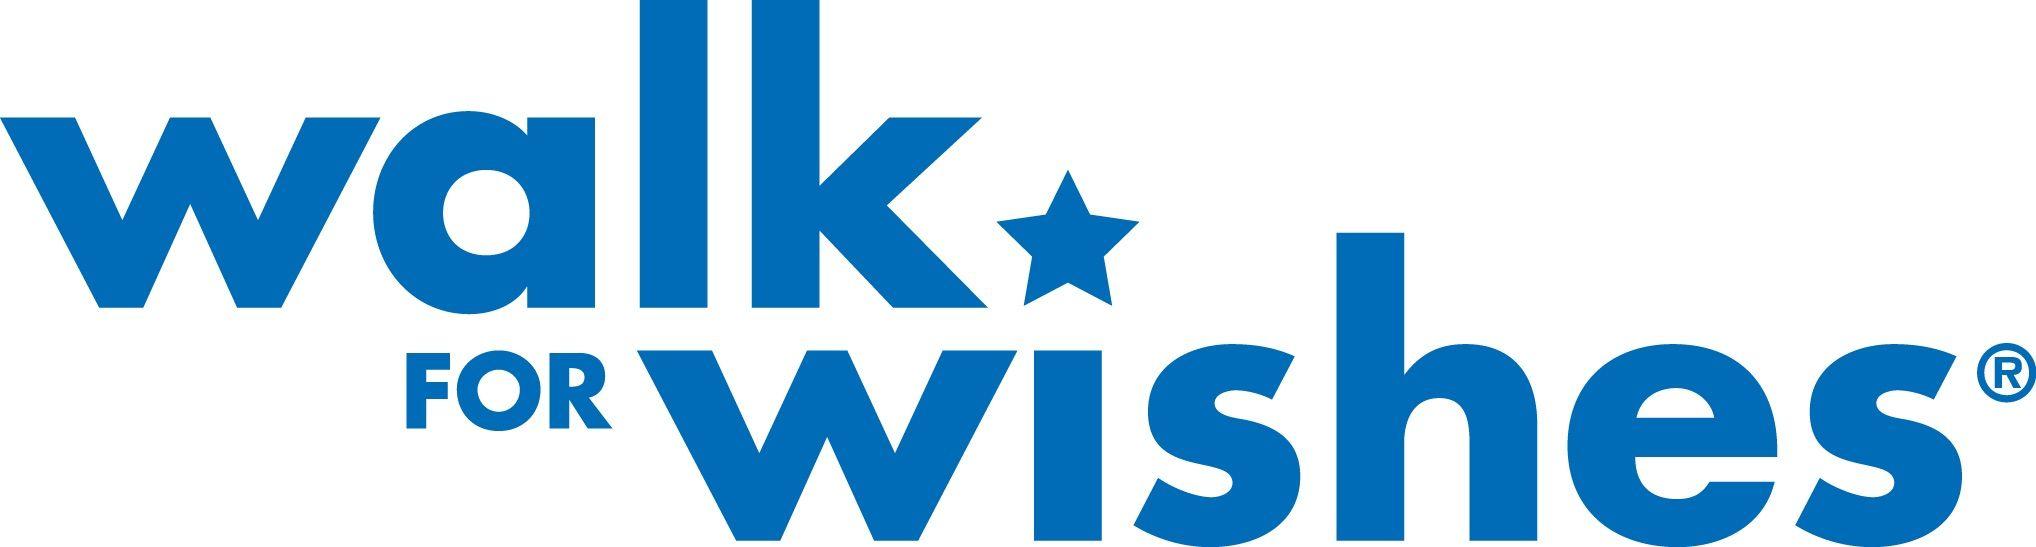 Make A Wish Walk For Wishes Make a wish foundation, Make